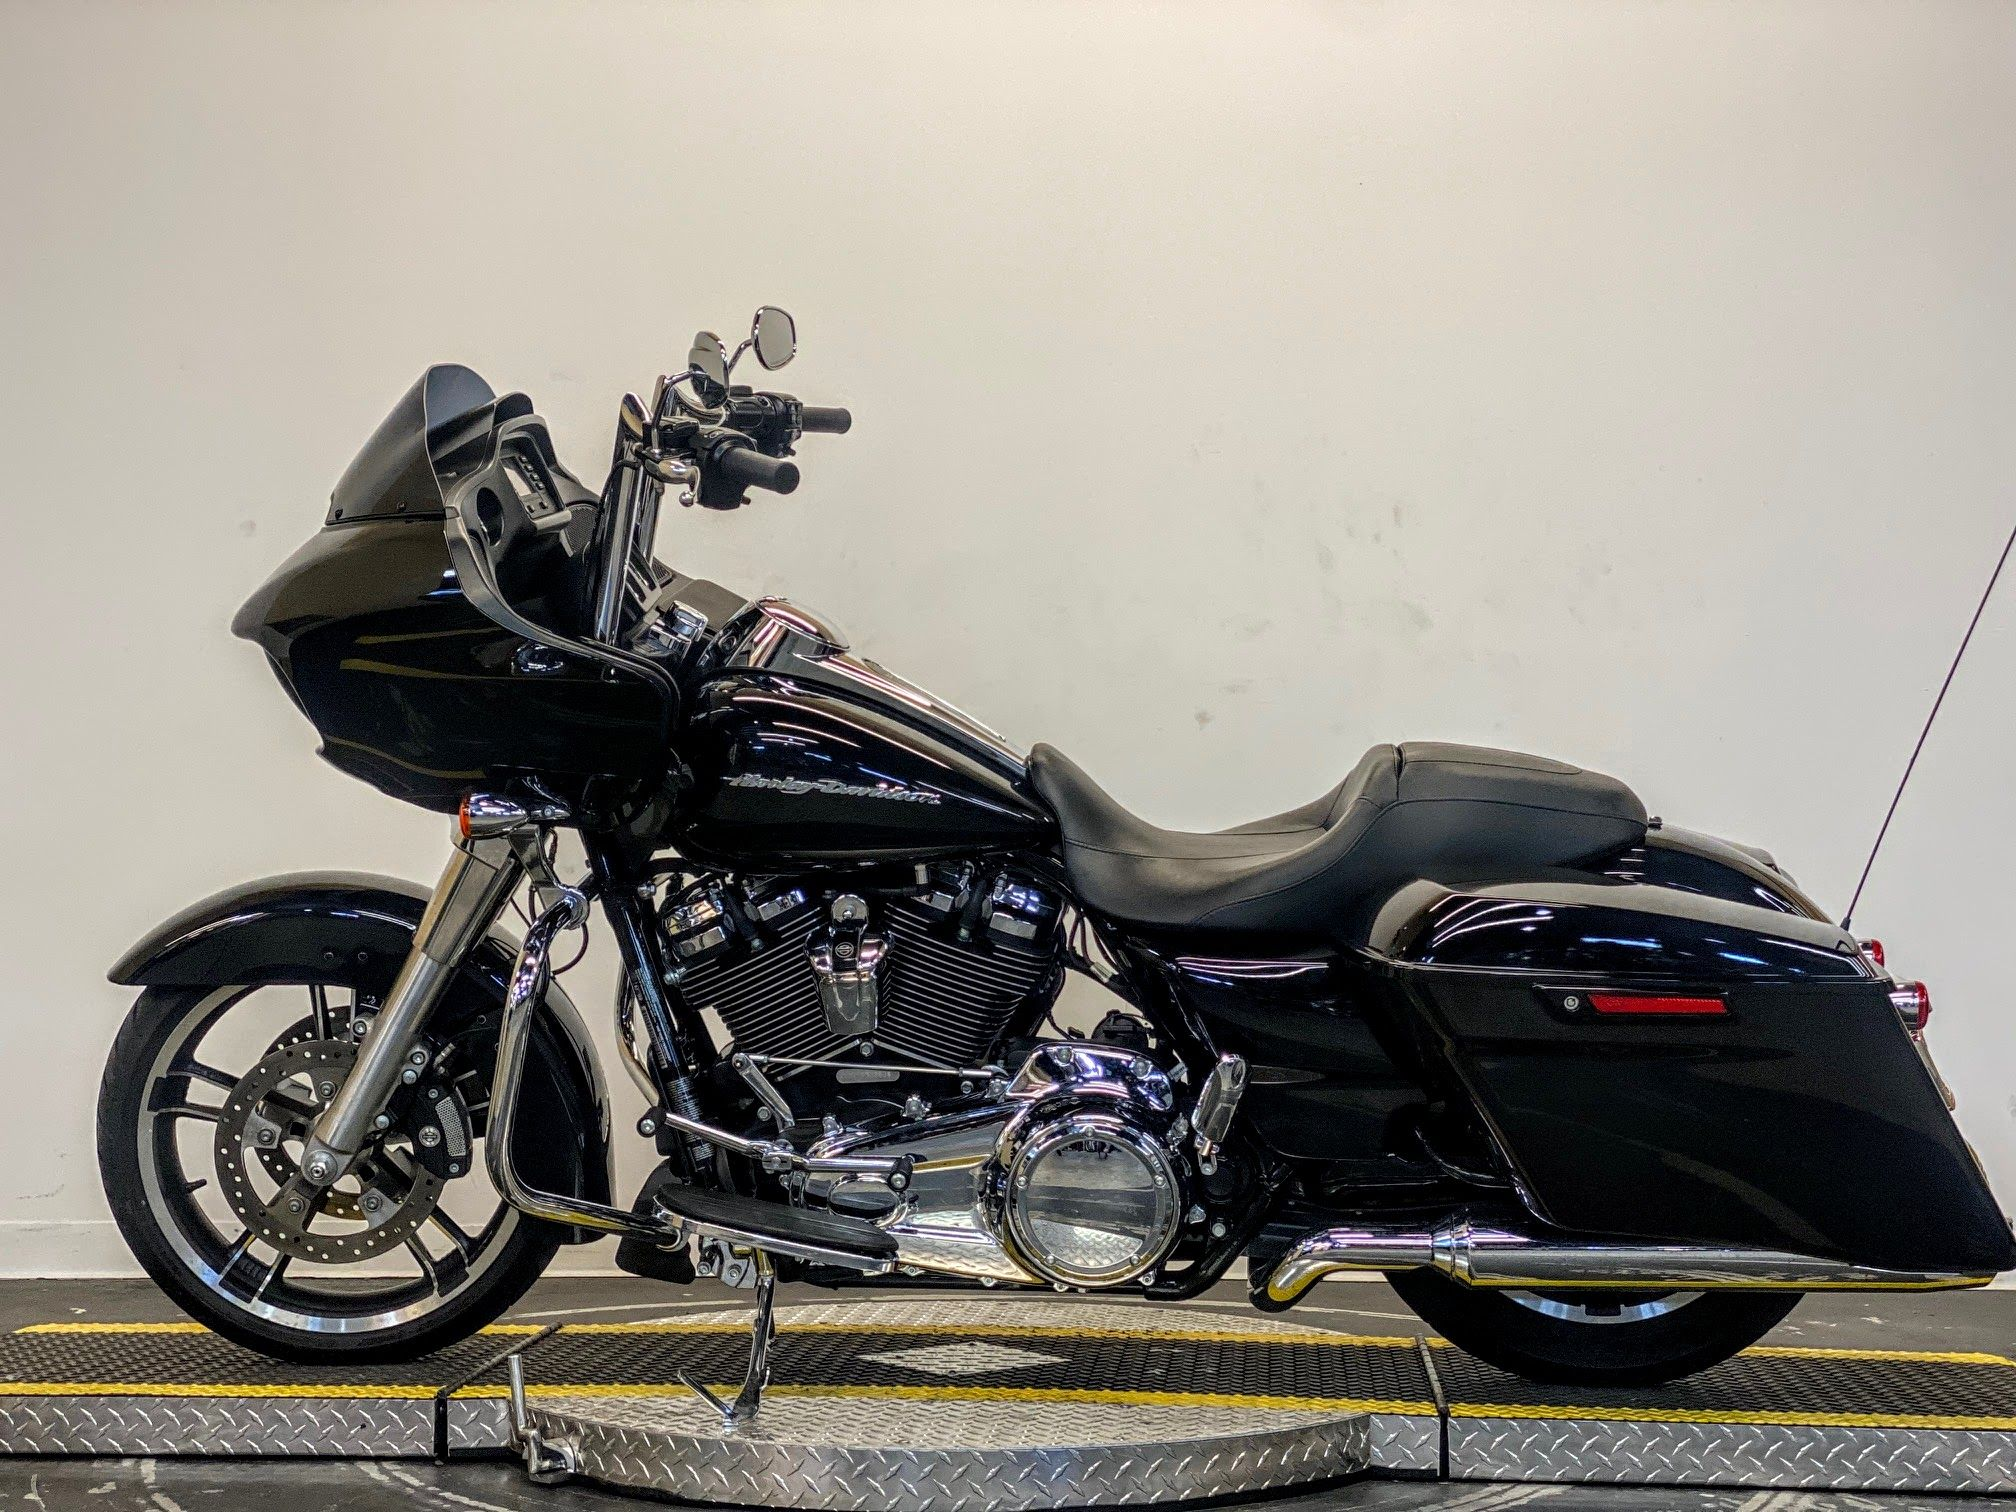 Pre Owned 2019 Harley Davidson Road Glide Fltrx In Fort Walton Beach Pf653383 Emerald Coast Harley Davidson